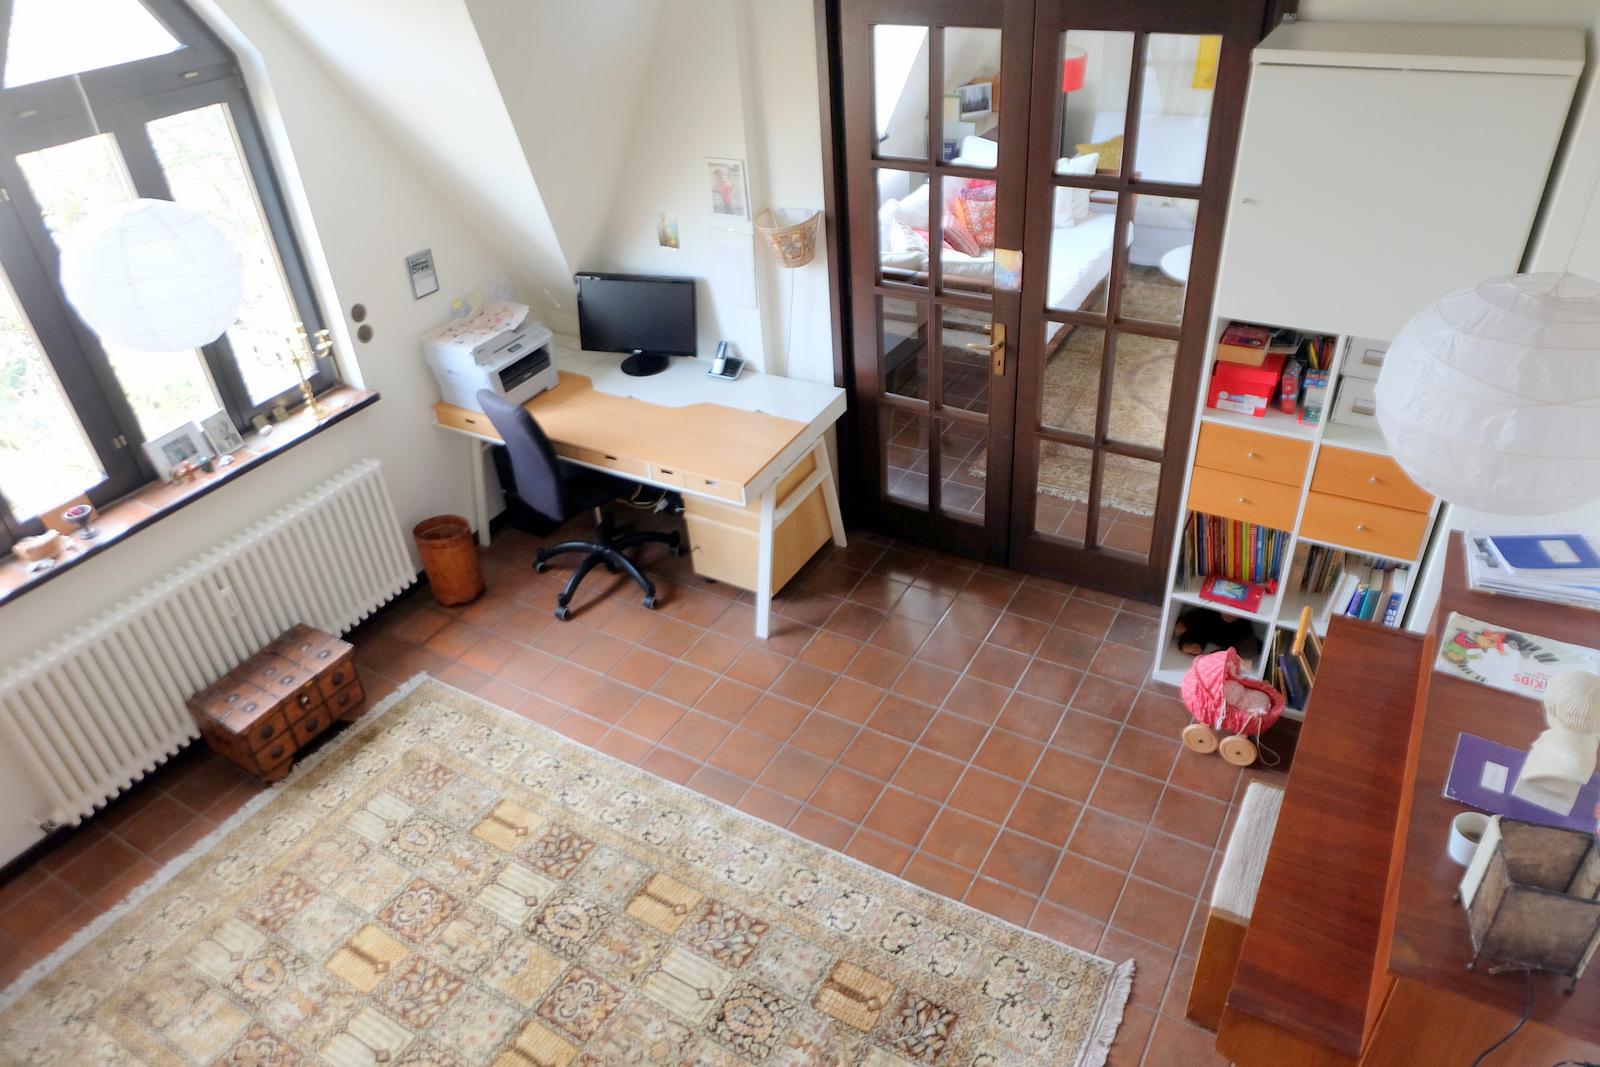 dscf1503 Roof apartment %Bockenheim